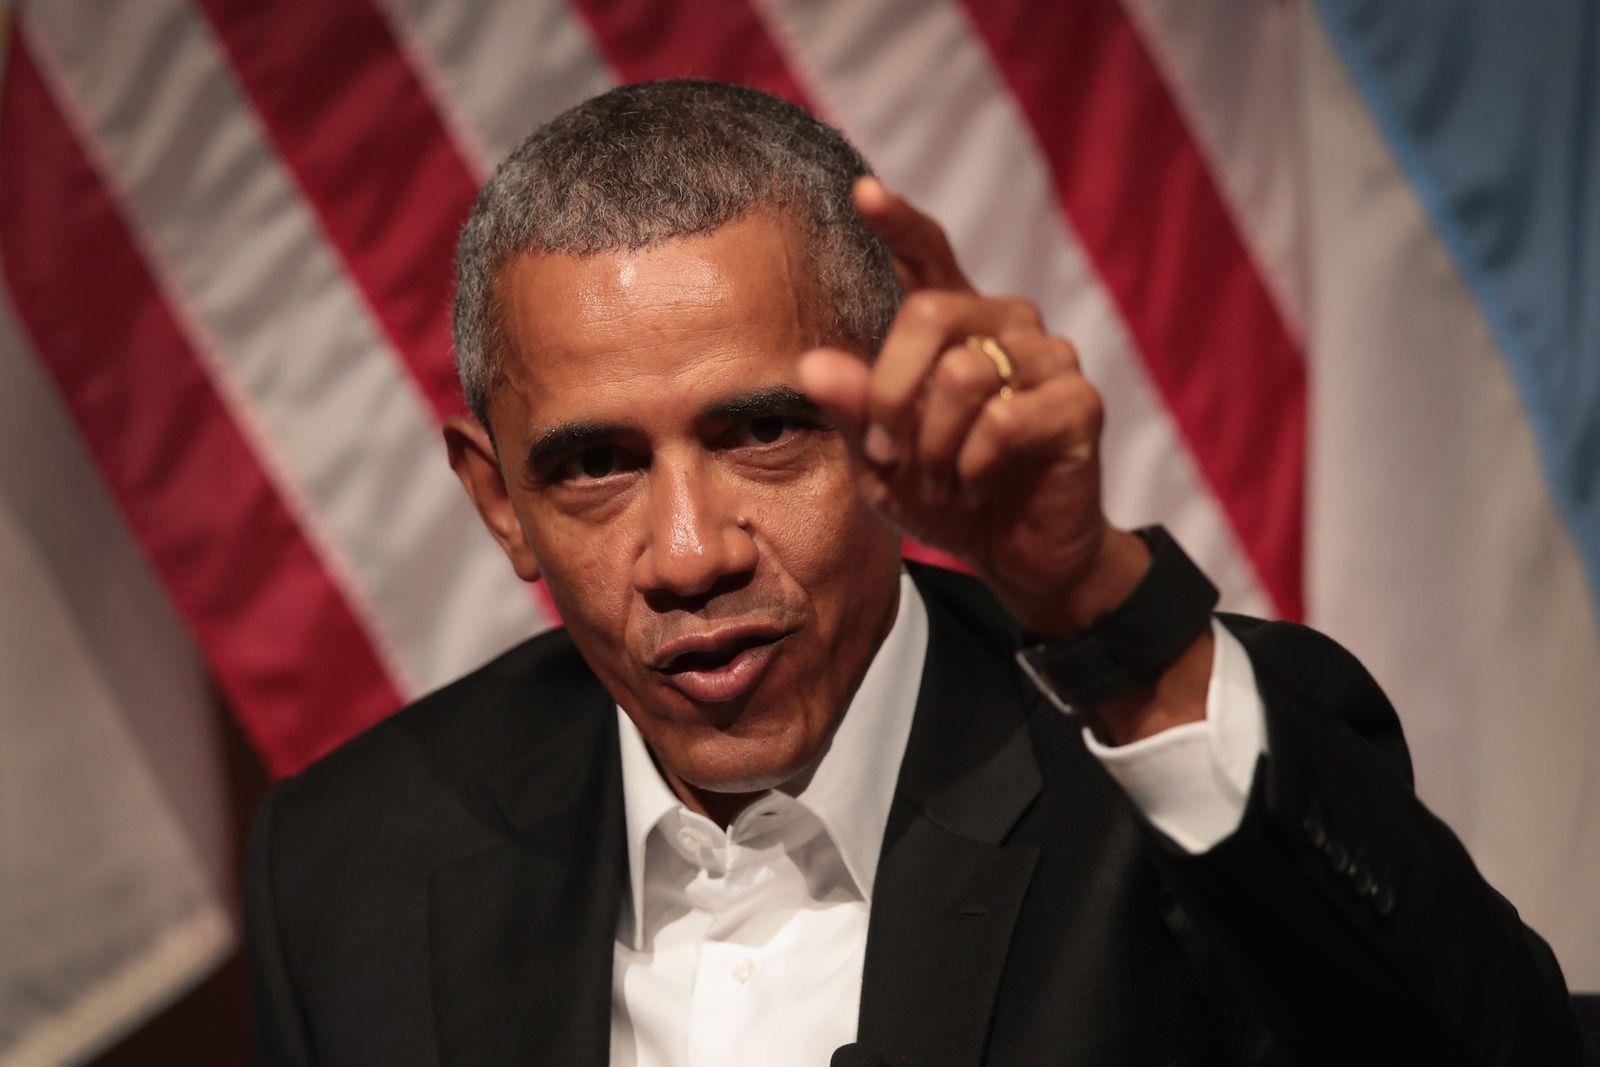 US-FORMER-PRESIDENT-OBAMA-SPEAKS-ON-CIVIC-ENGAGEMENT-AT-THE-UNIV